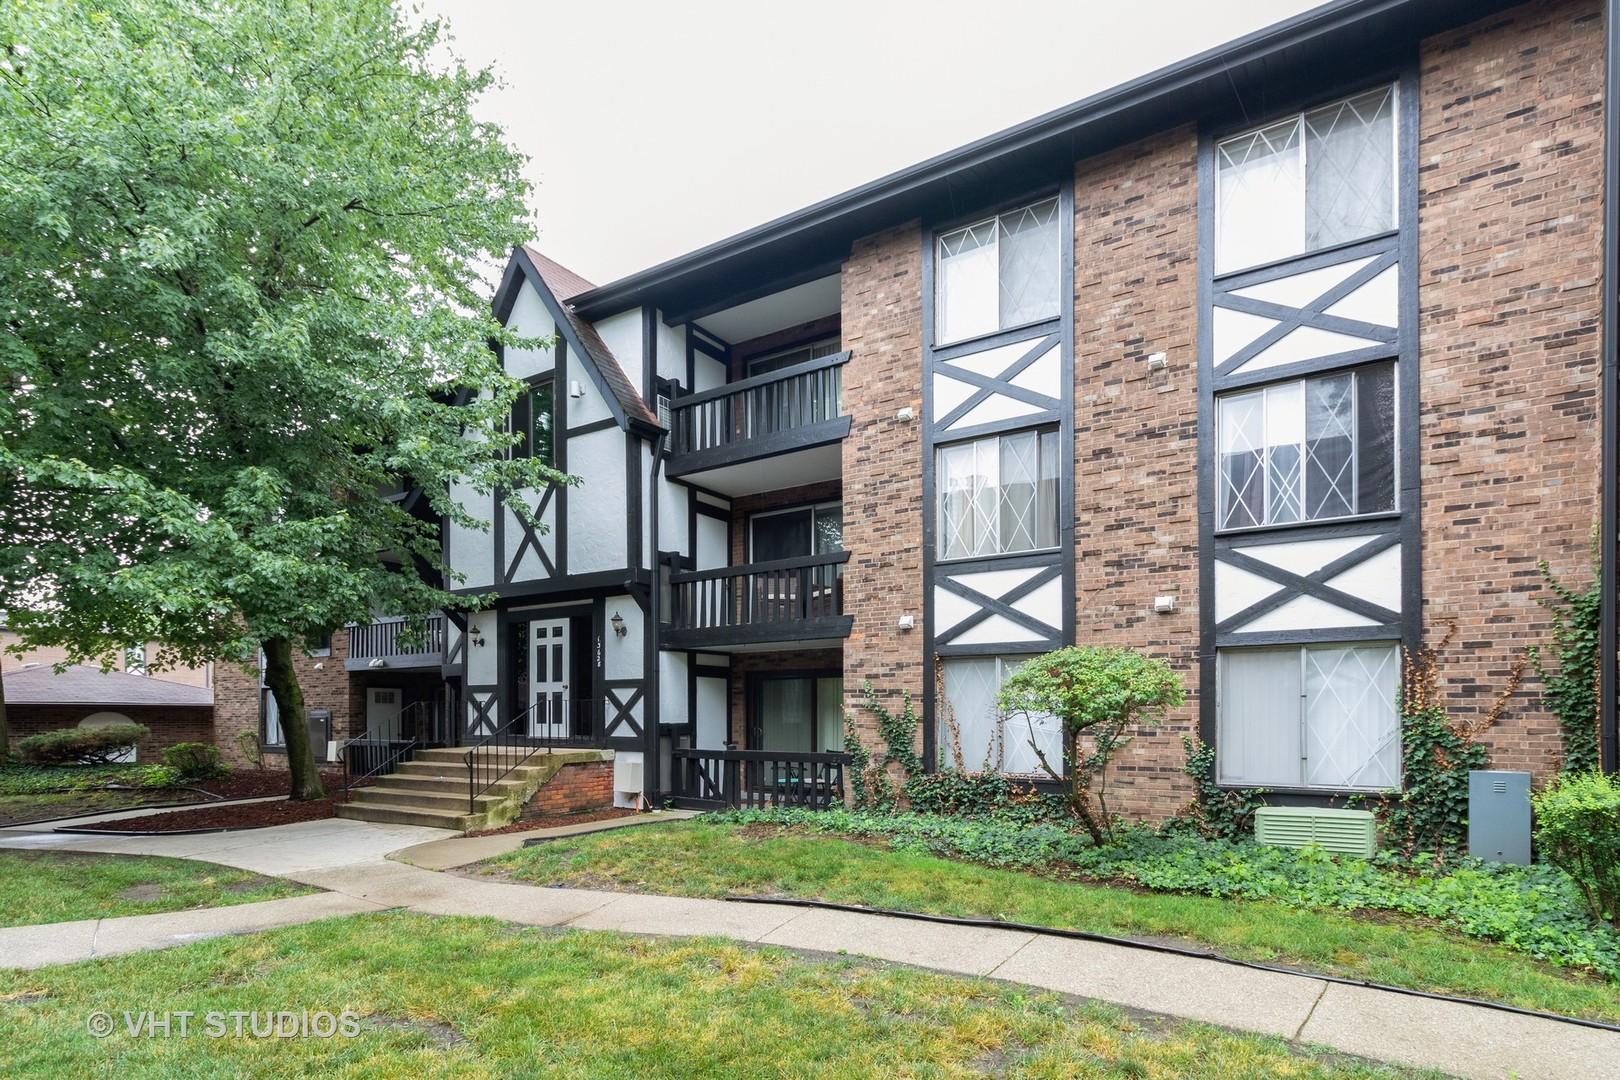 Property Search Results | Illinois Star, Ltd  REALTORS